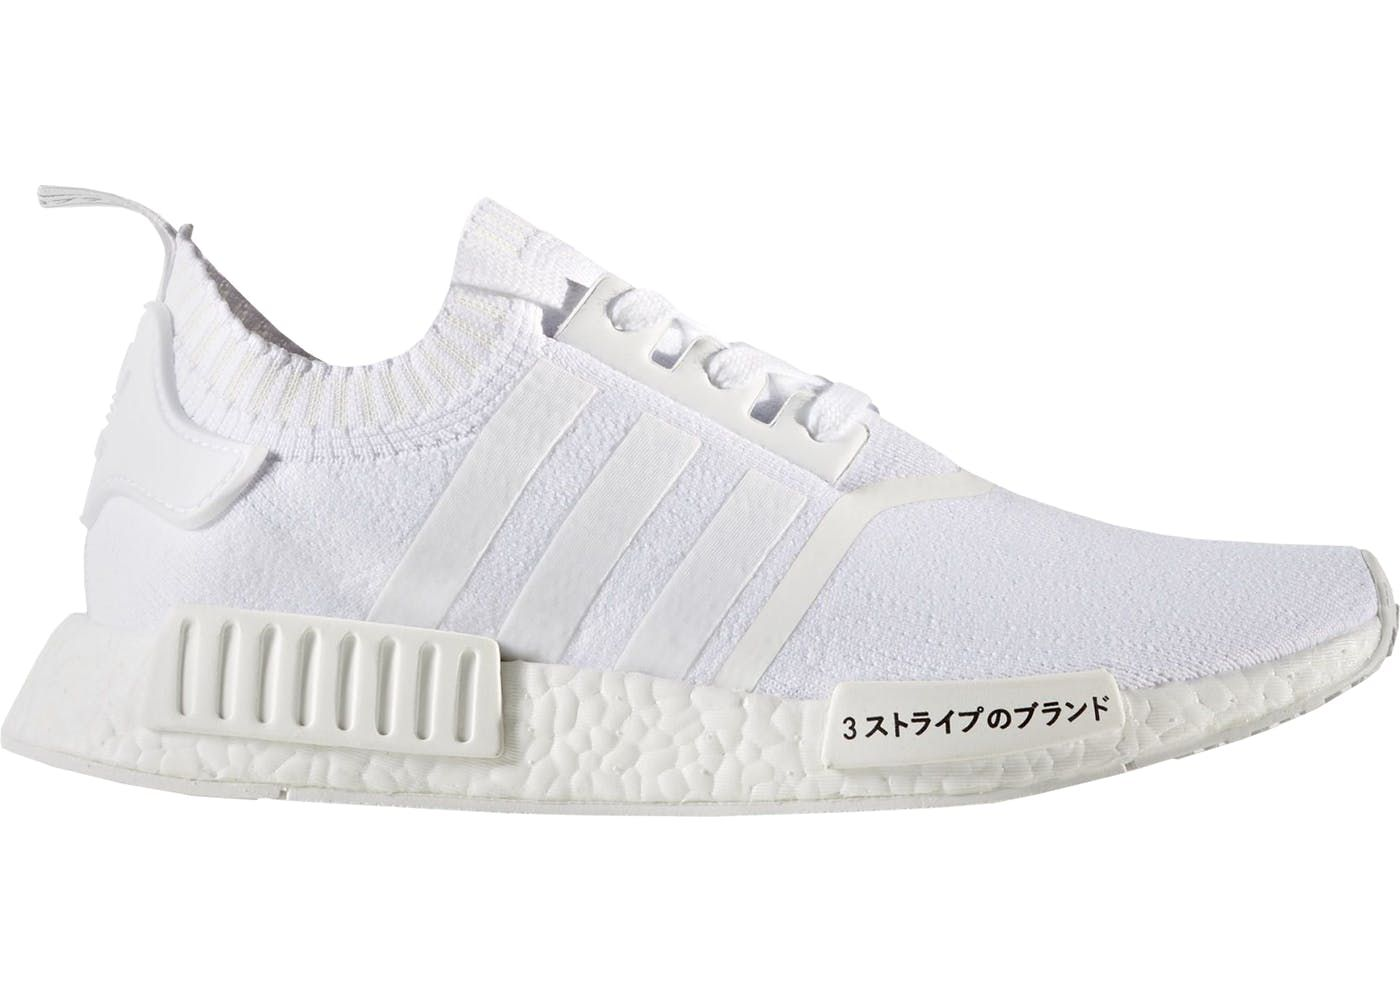 adidas NMD R1 Japan Triple White in